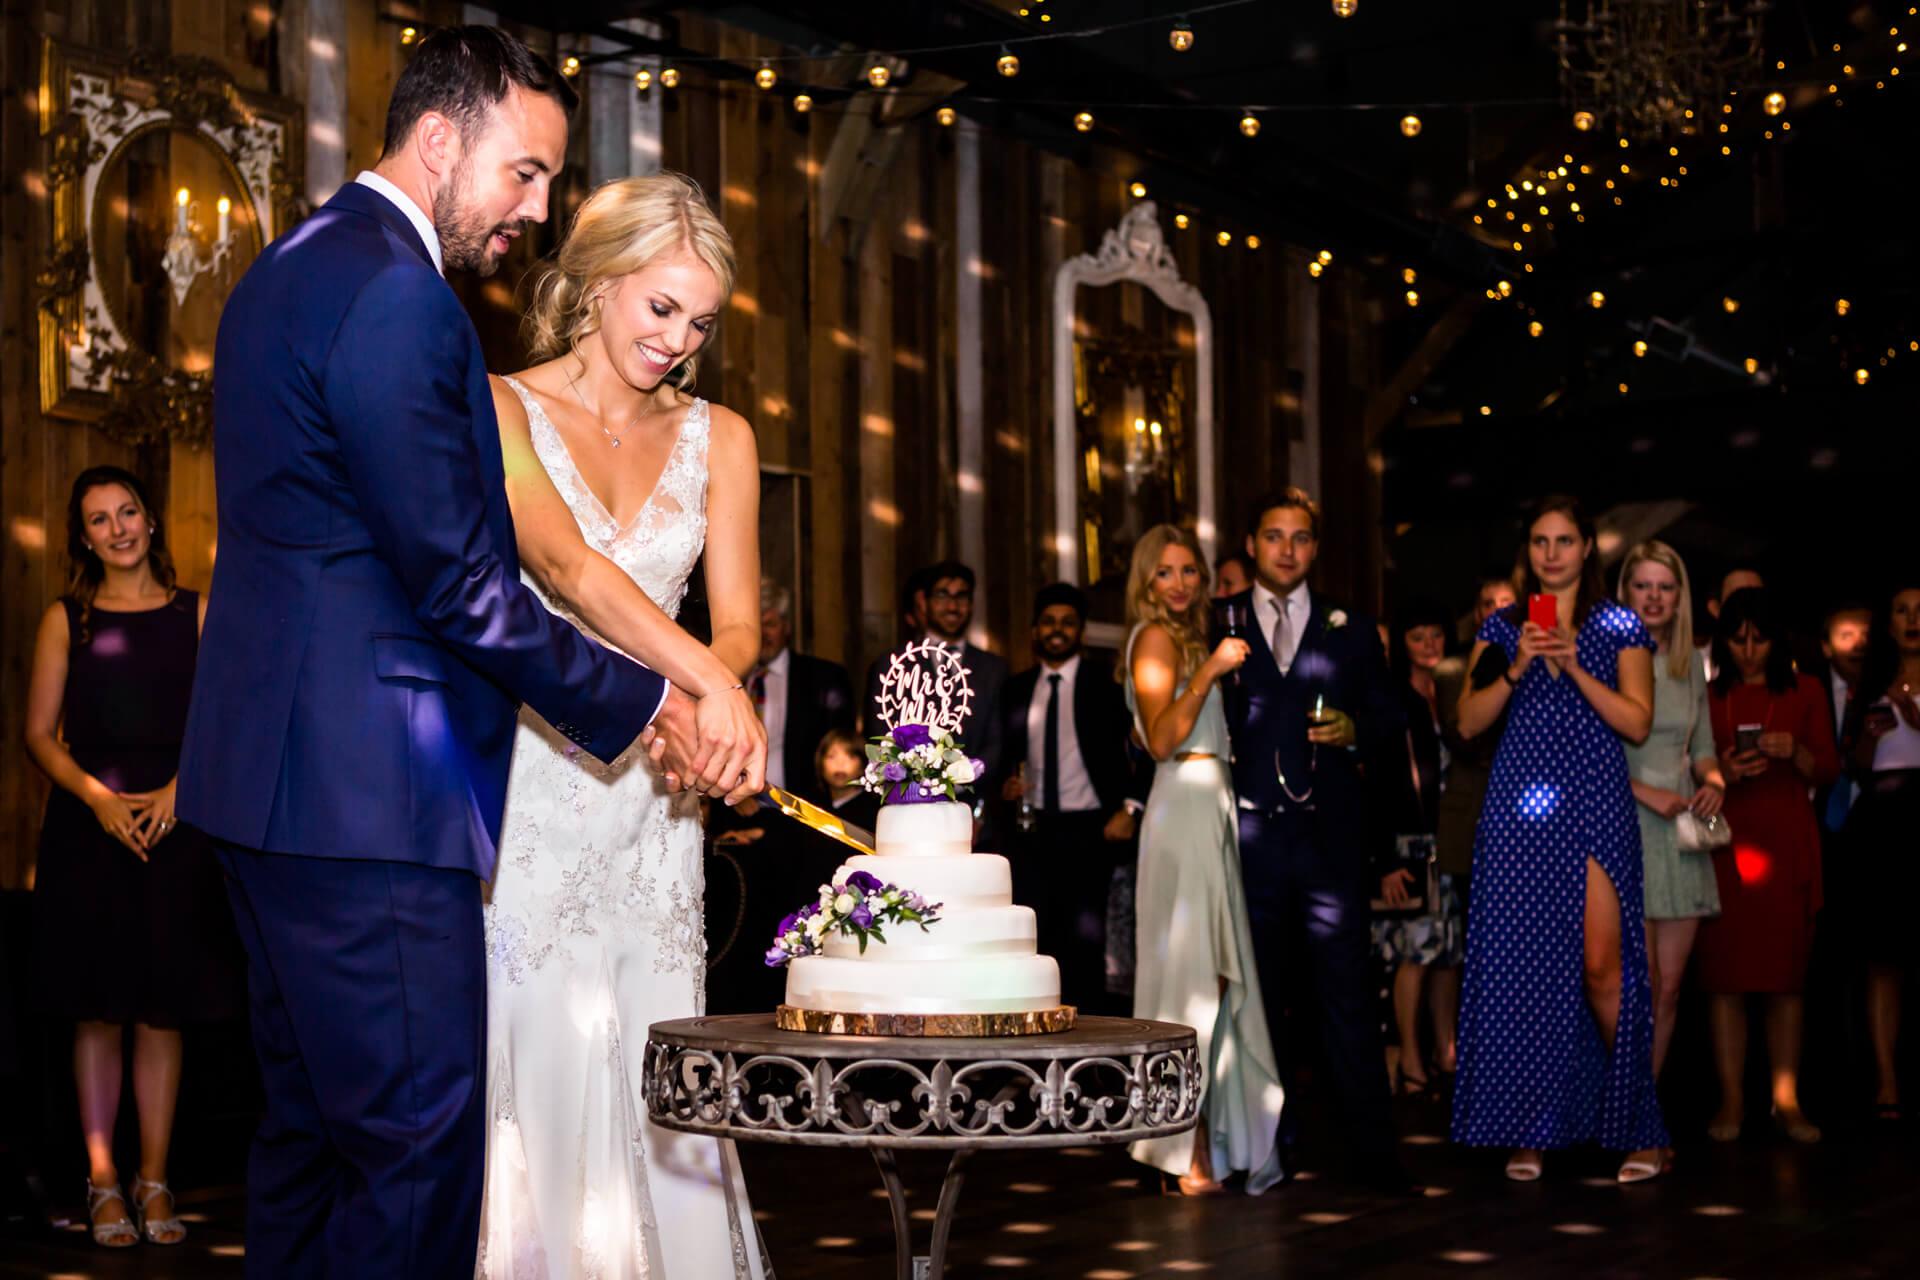 wedding couple cutting the cake at Wharfedale Grange